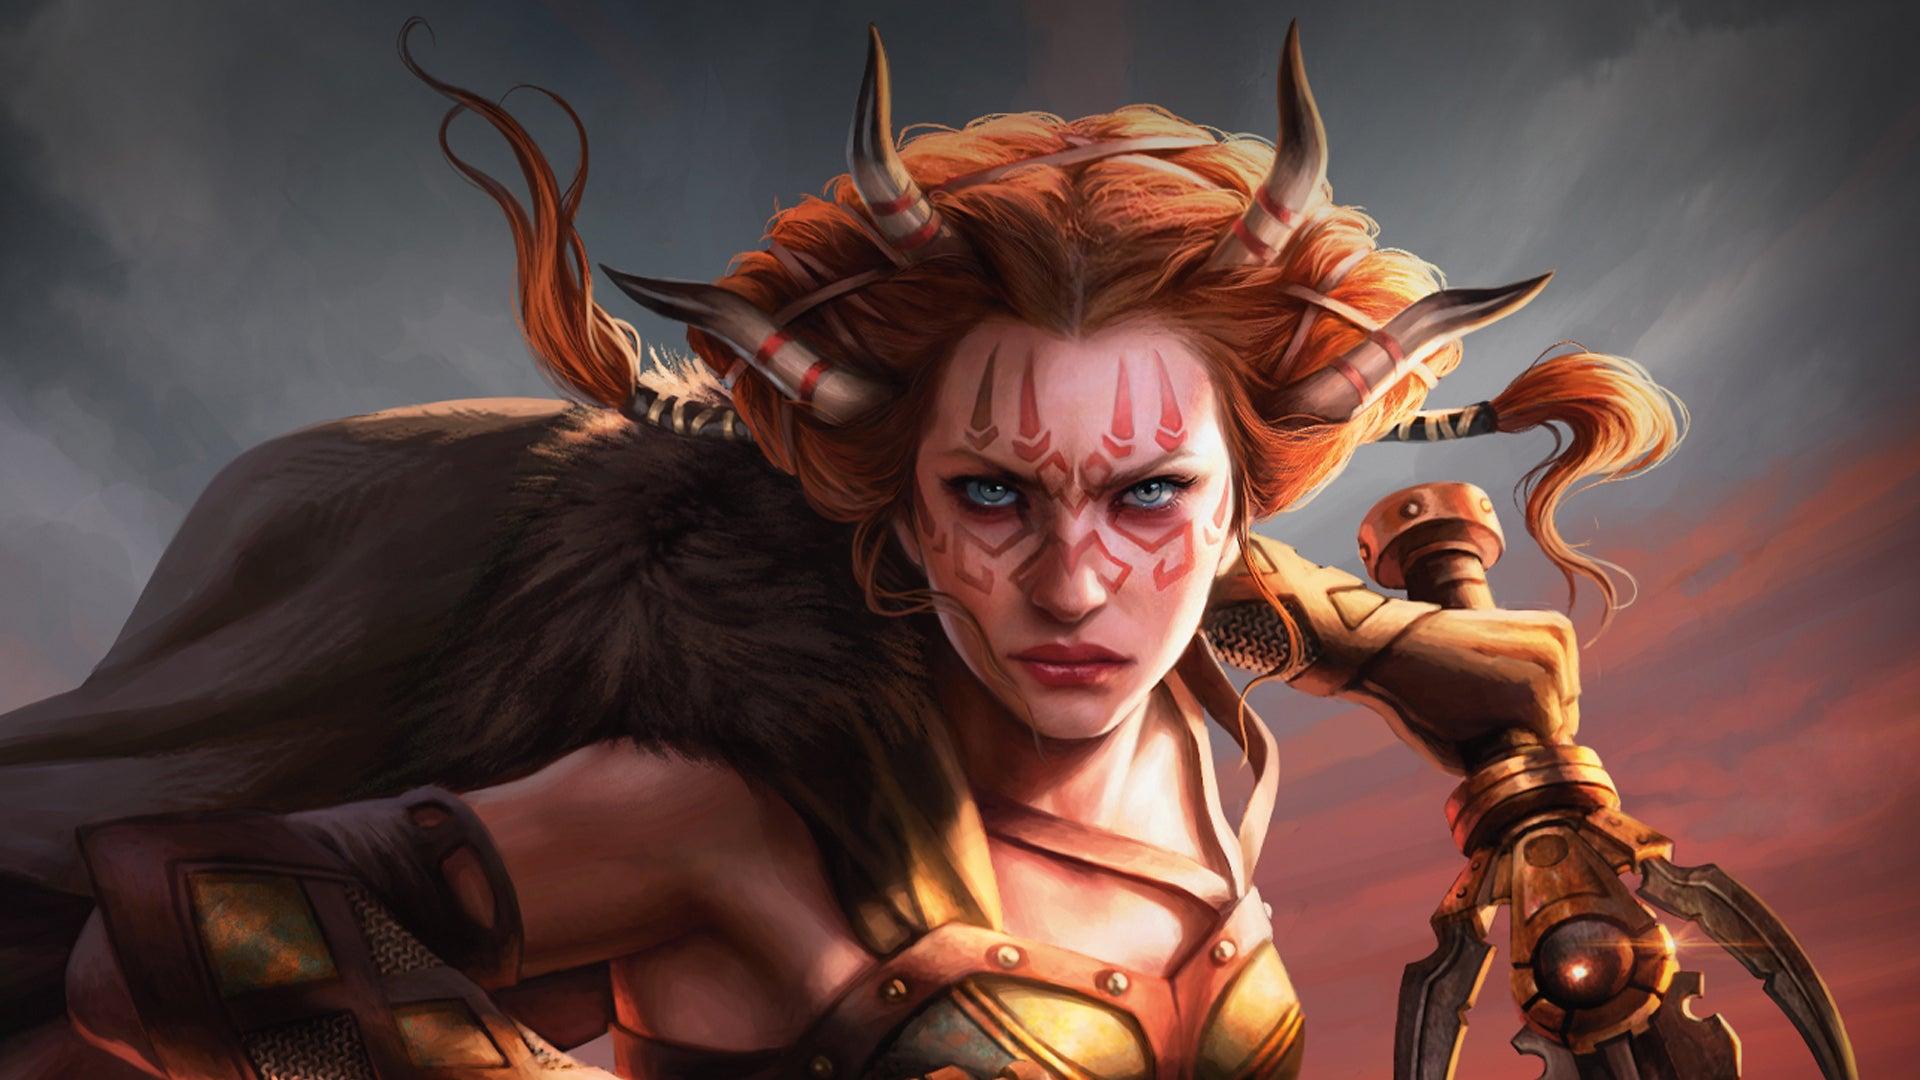 mtg-commander-legends-artwork.jpg